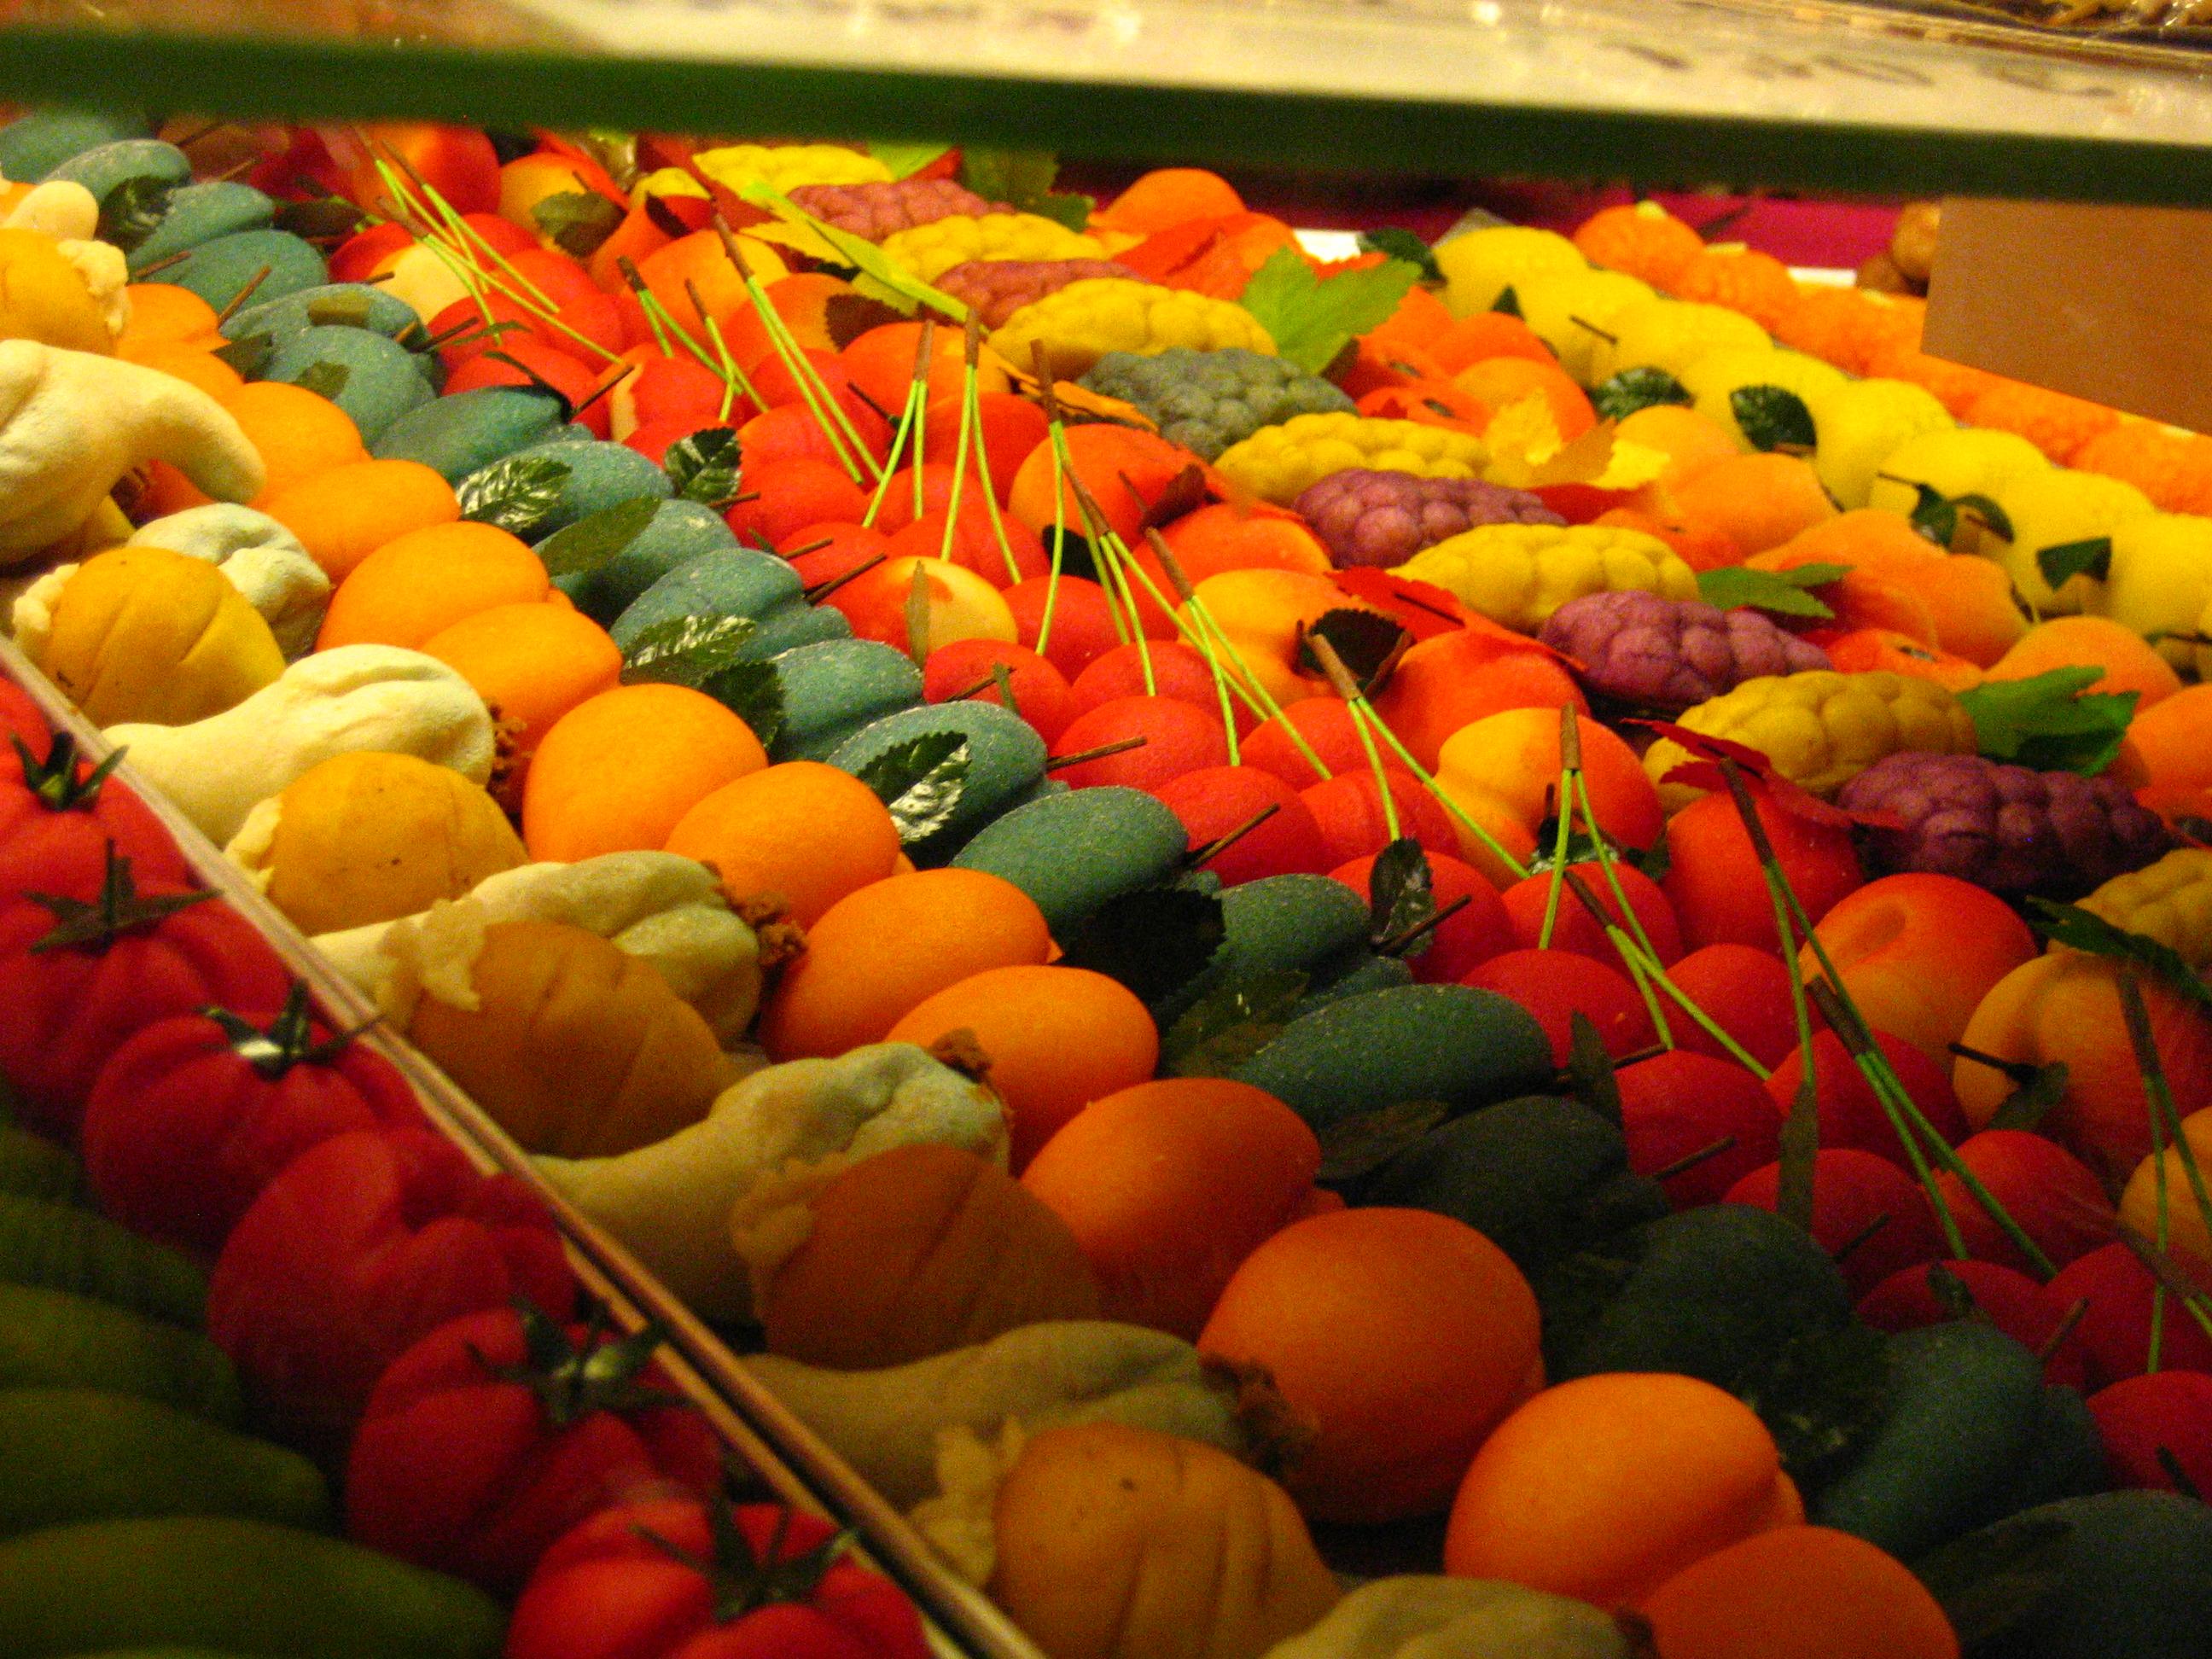 File:Marzipan fruits at the Nuremberg Christmas Market.jpg ...